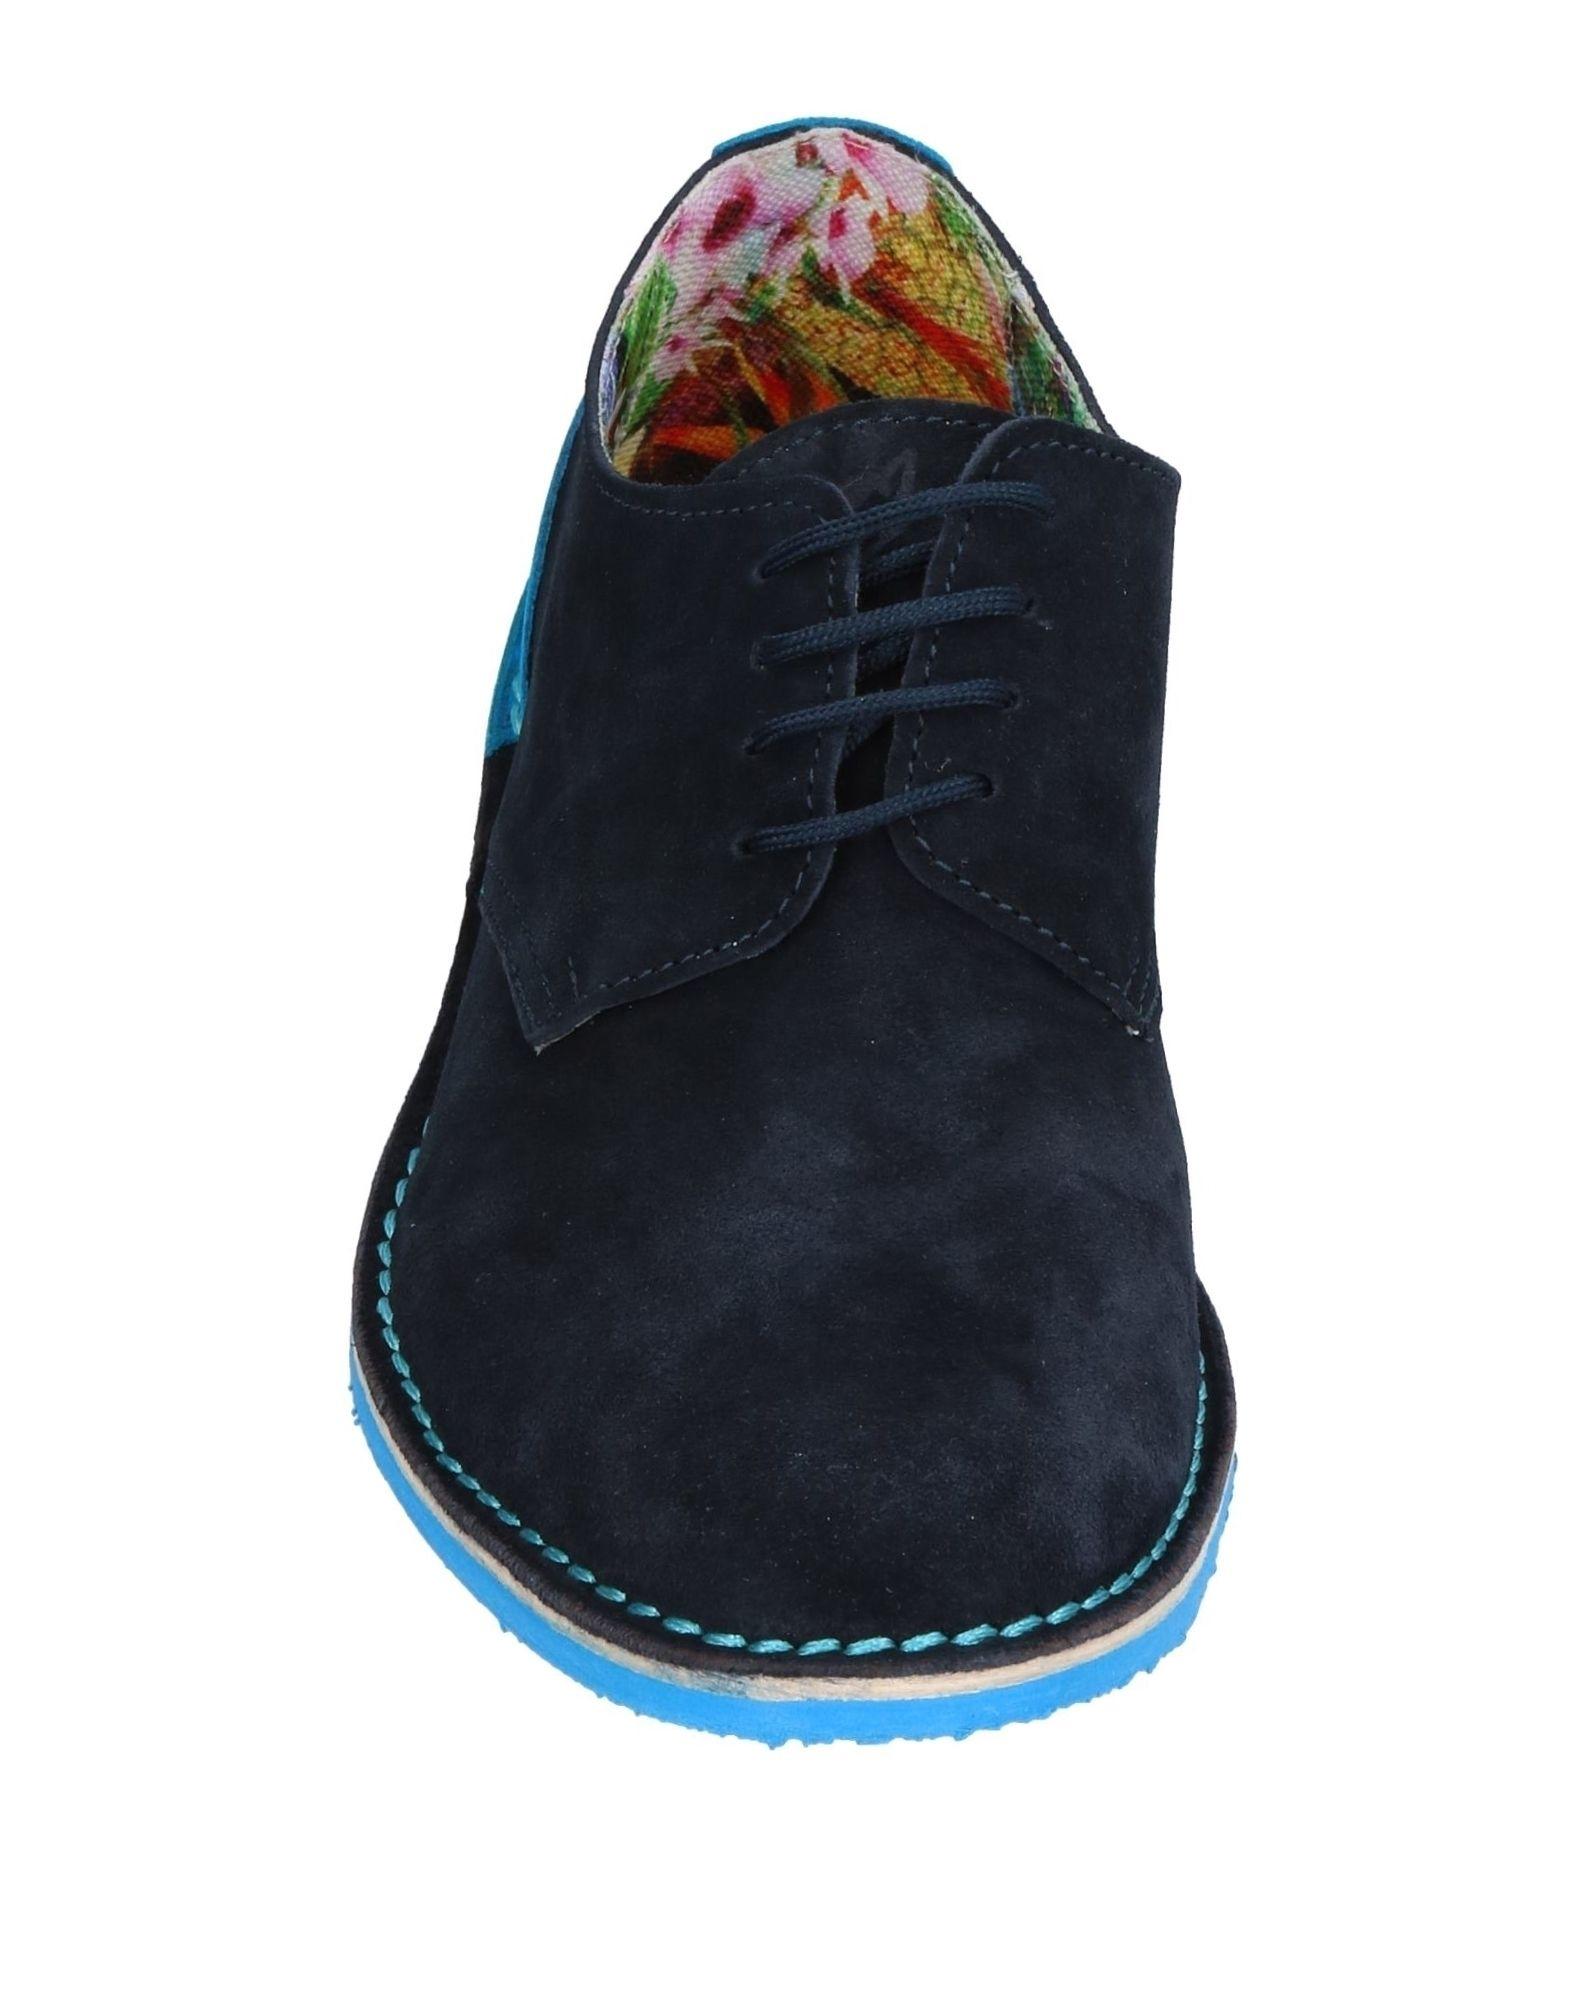 CHAUSSURES - Chaussures à lacetsPaolo Da Ponte q1c37PV